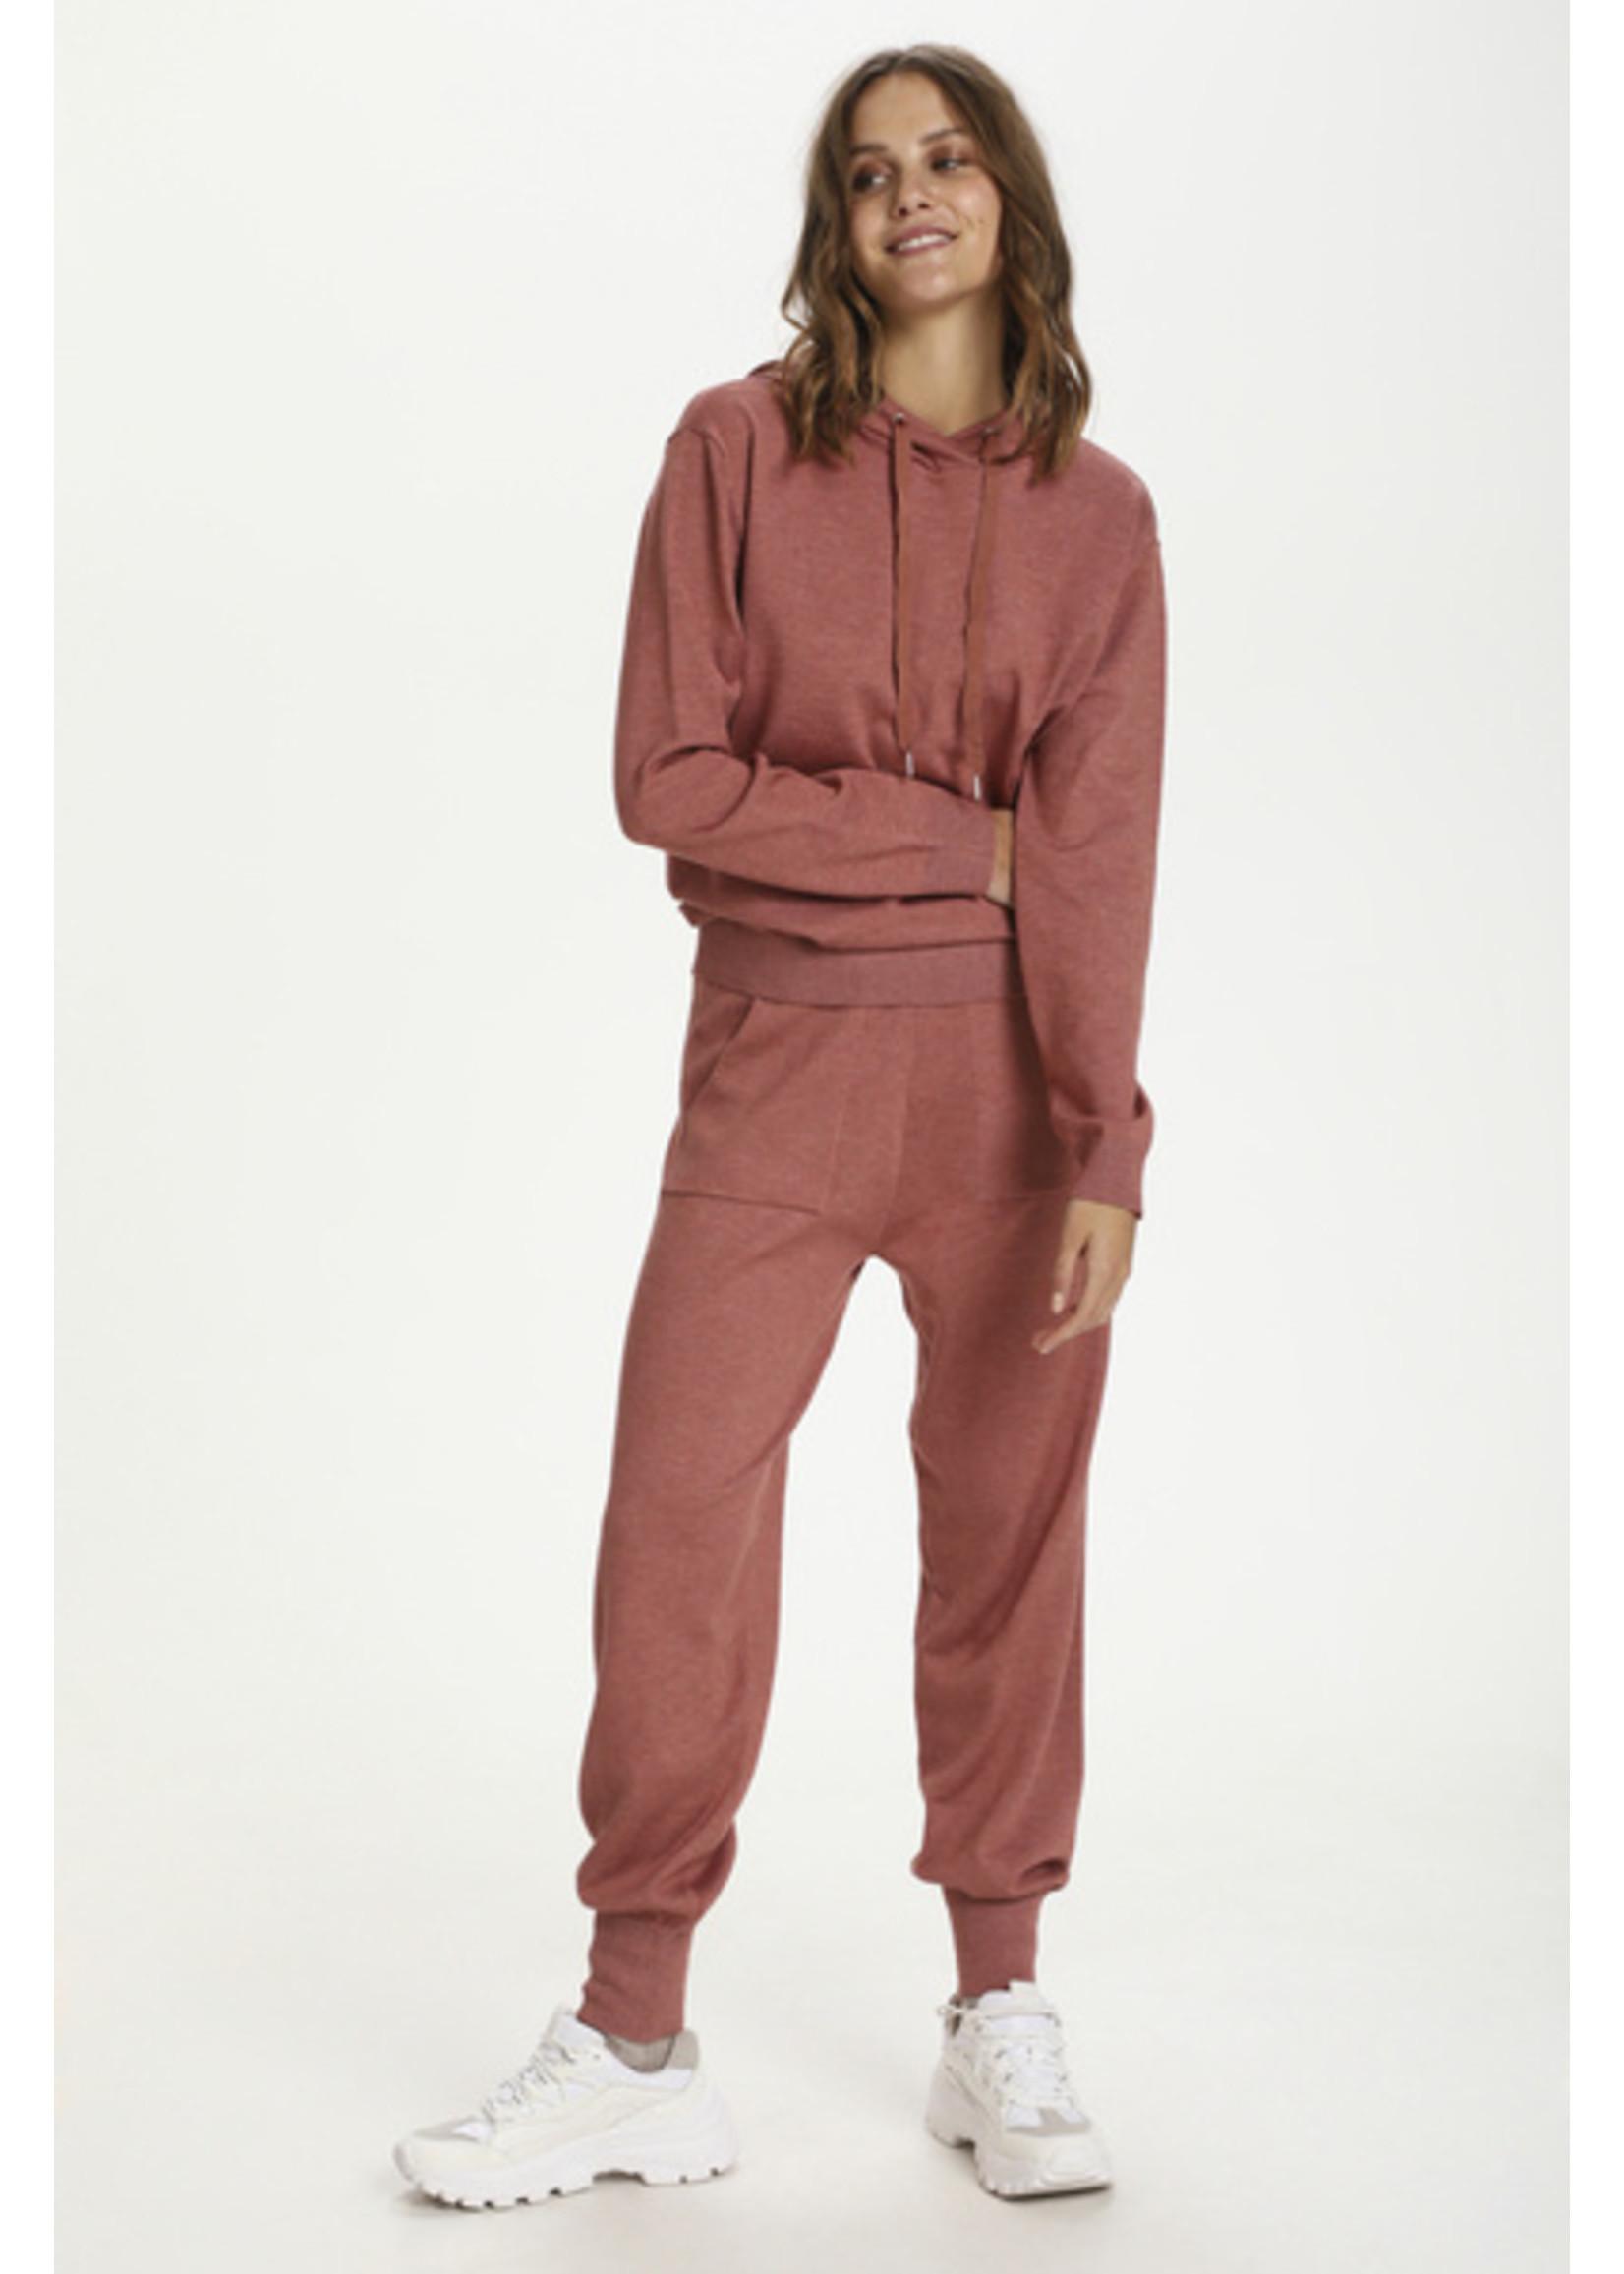 Saint Tropez Knit Pullover AdithaSZ Pullover